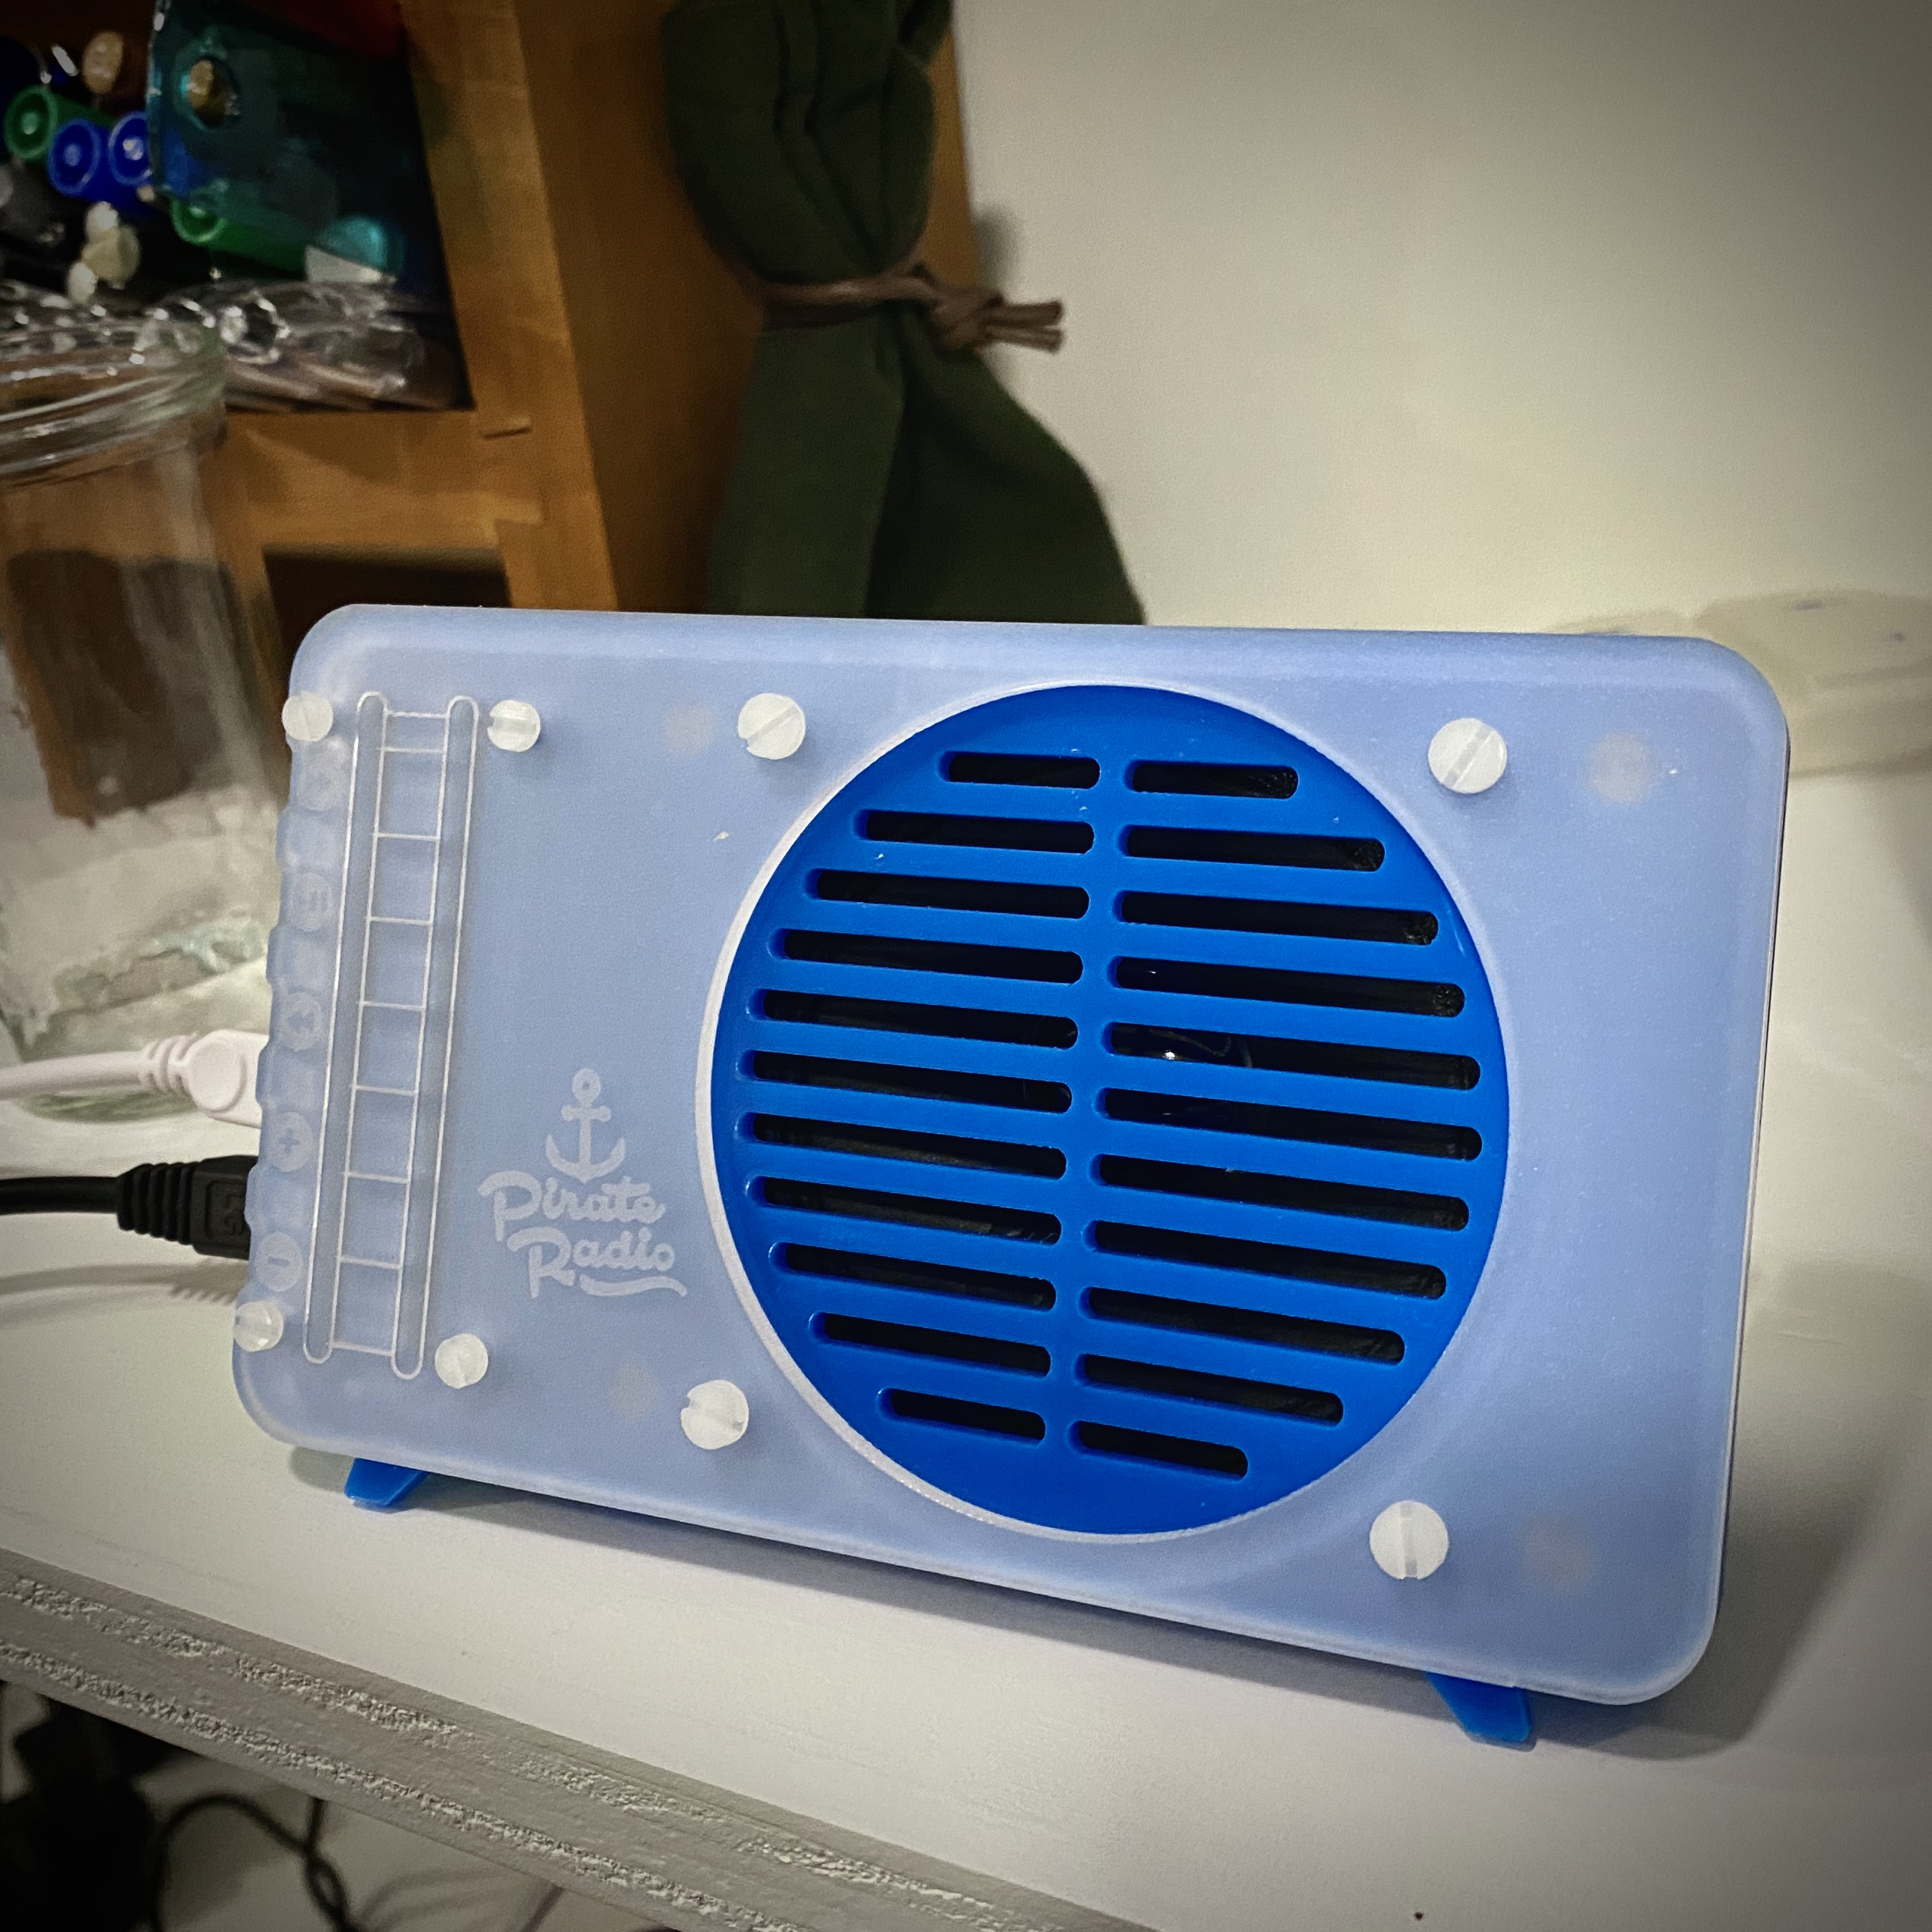 PirateRadio